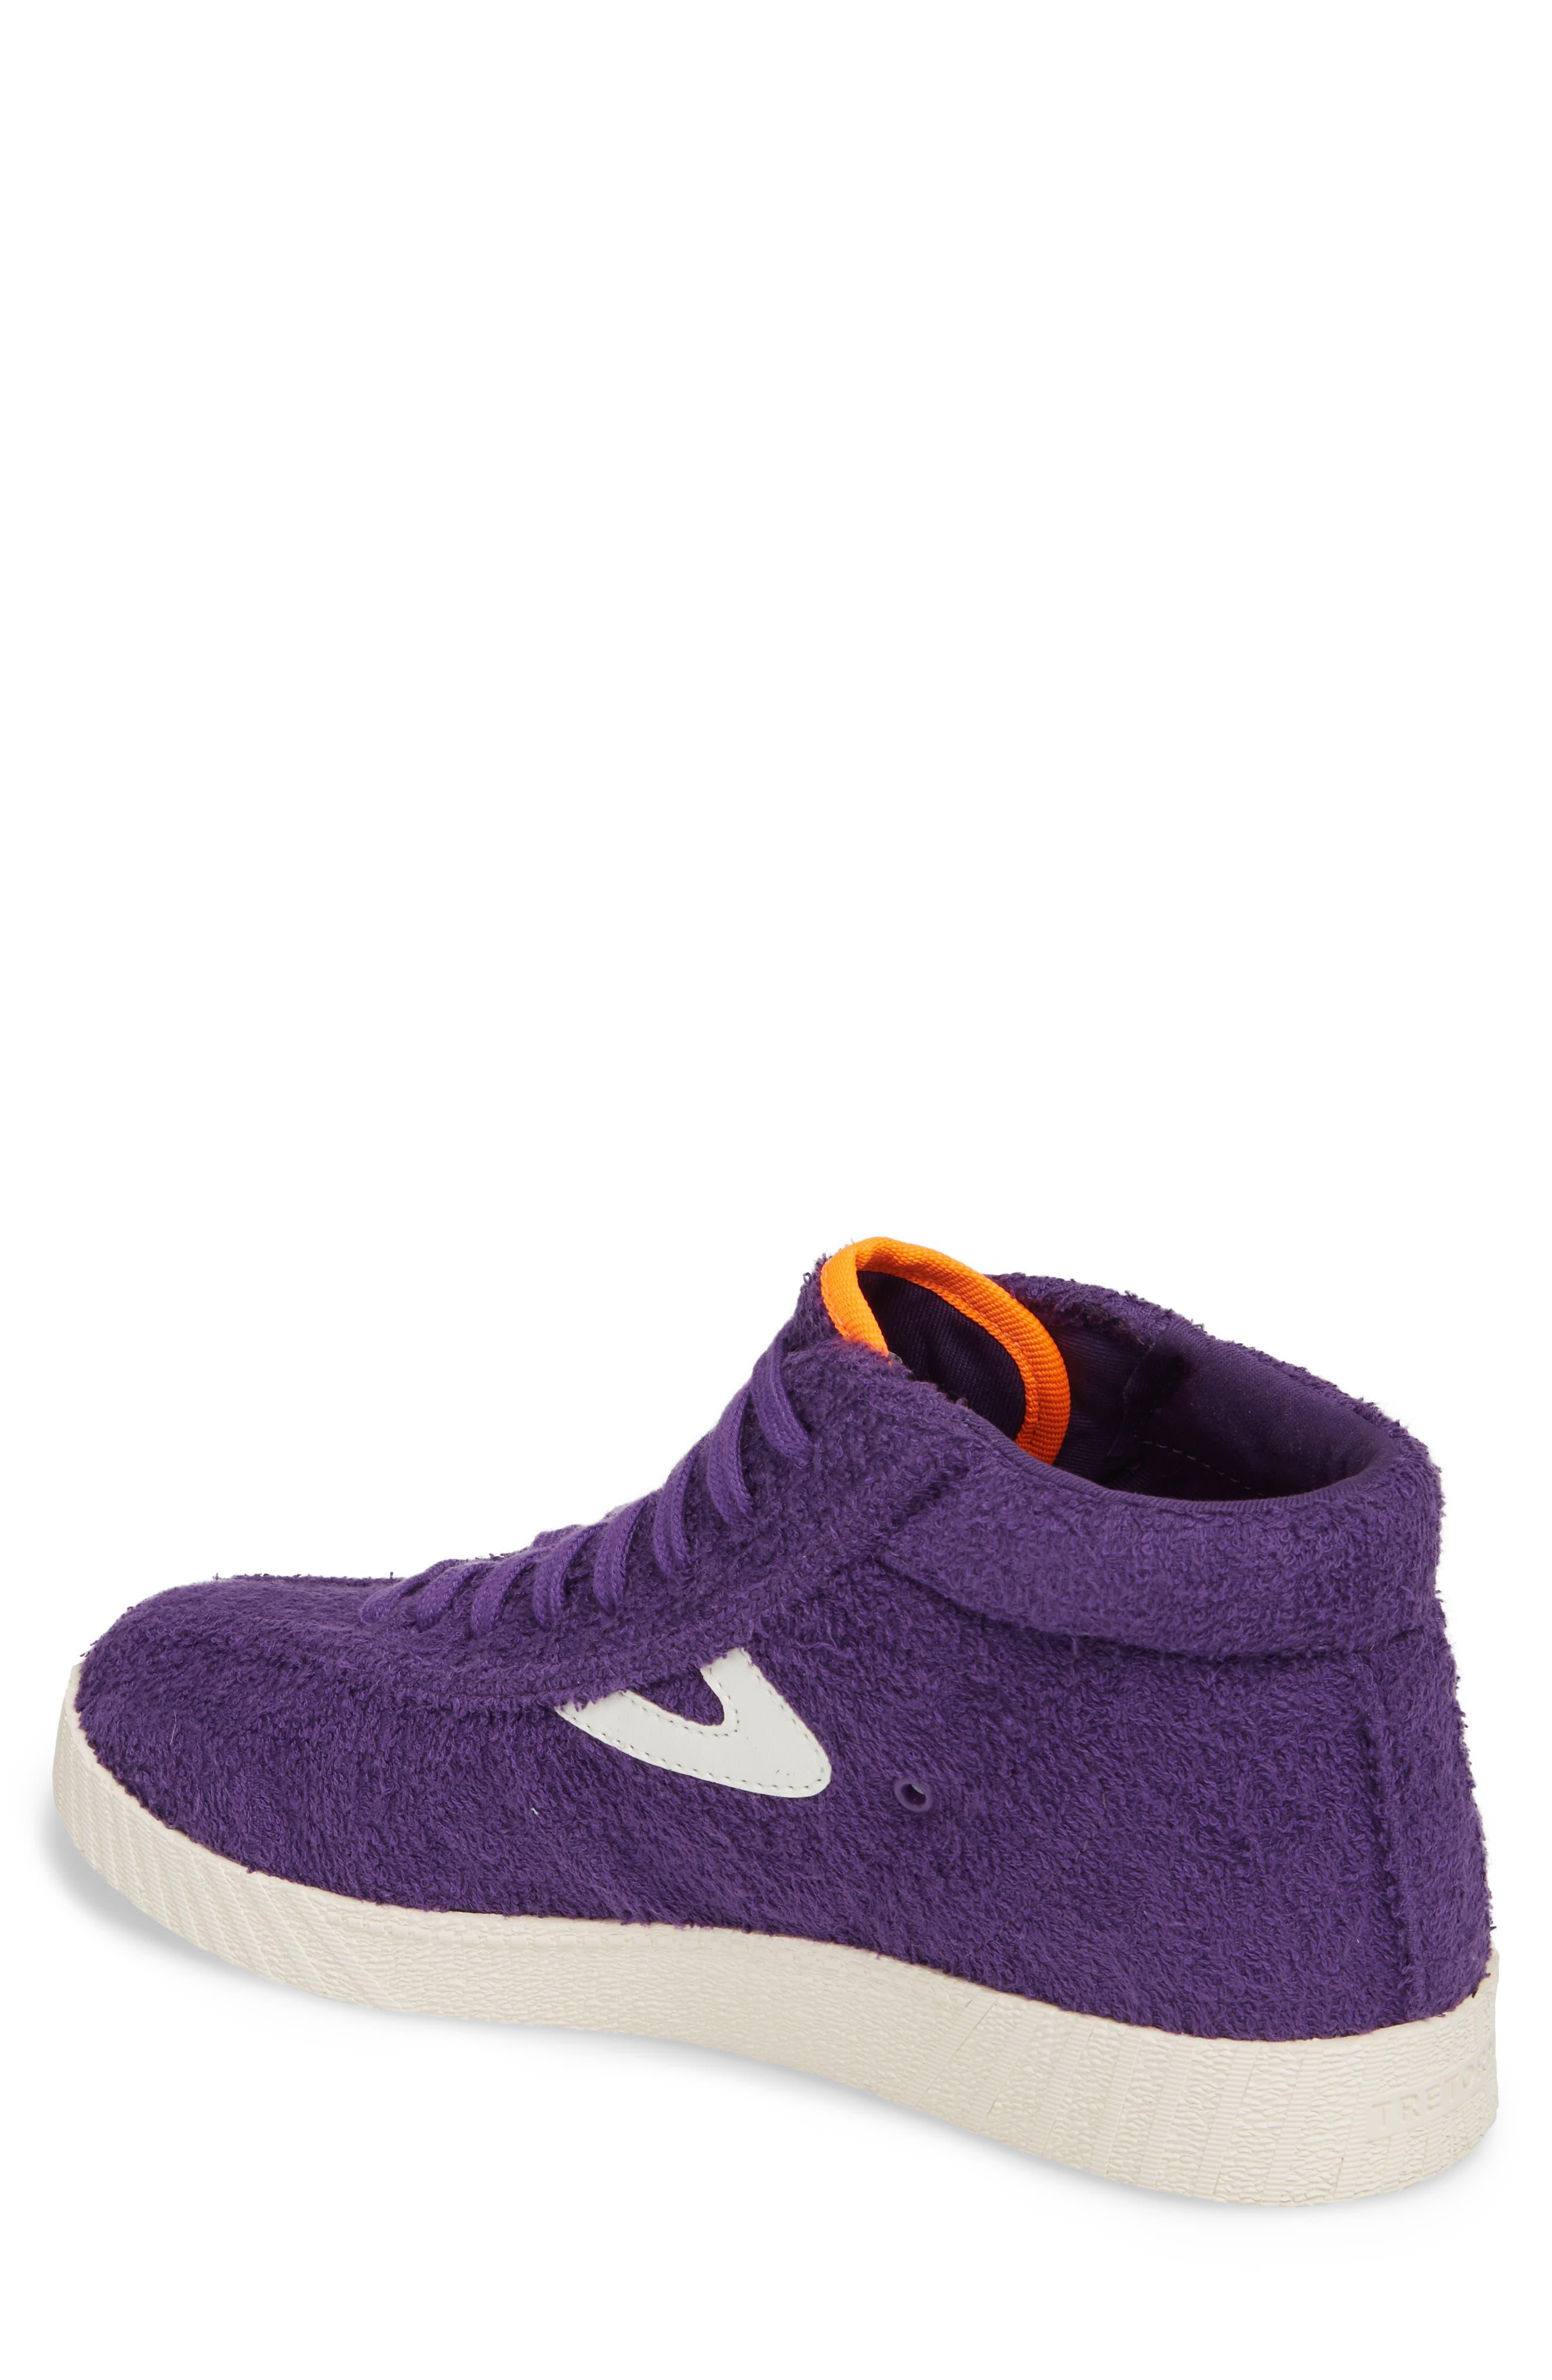 Andre 3000 Nylite High Top Sneaker,                             Alternate thumbnail 2, color,                             Vibrant Purple/ Vintage White